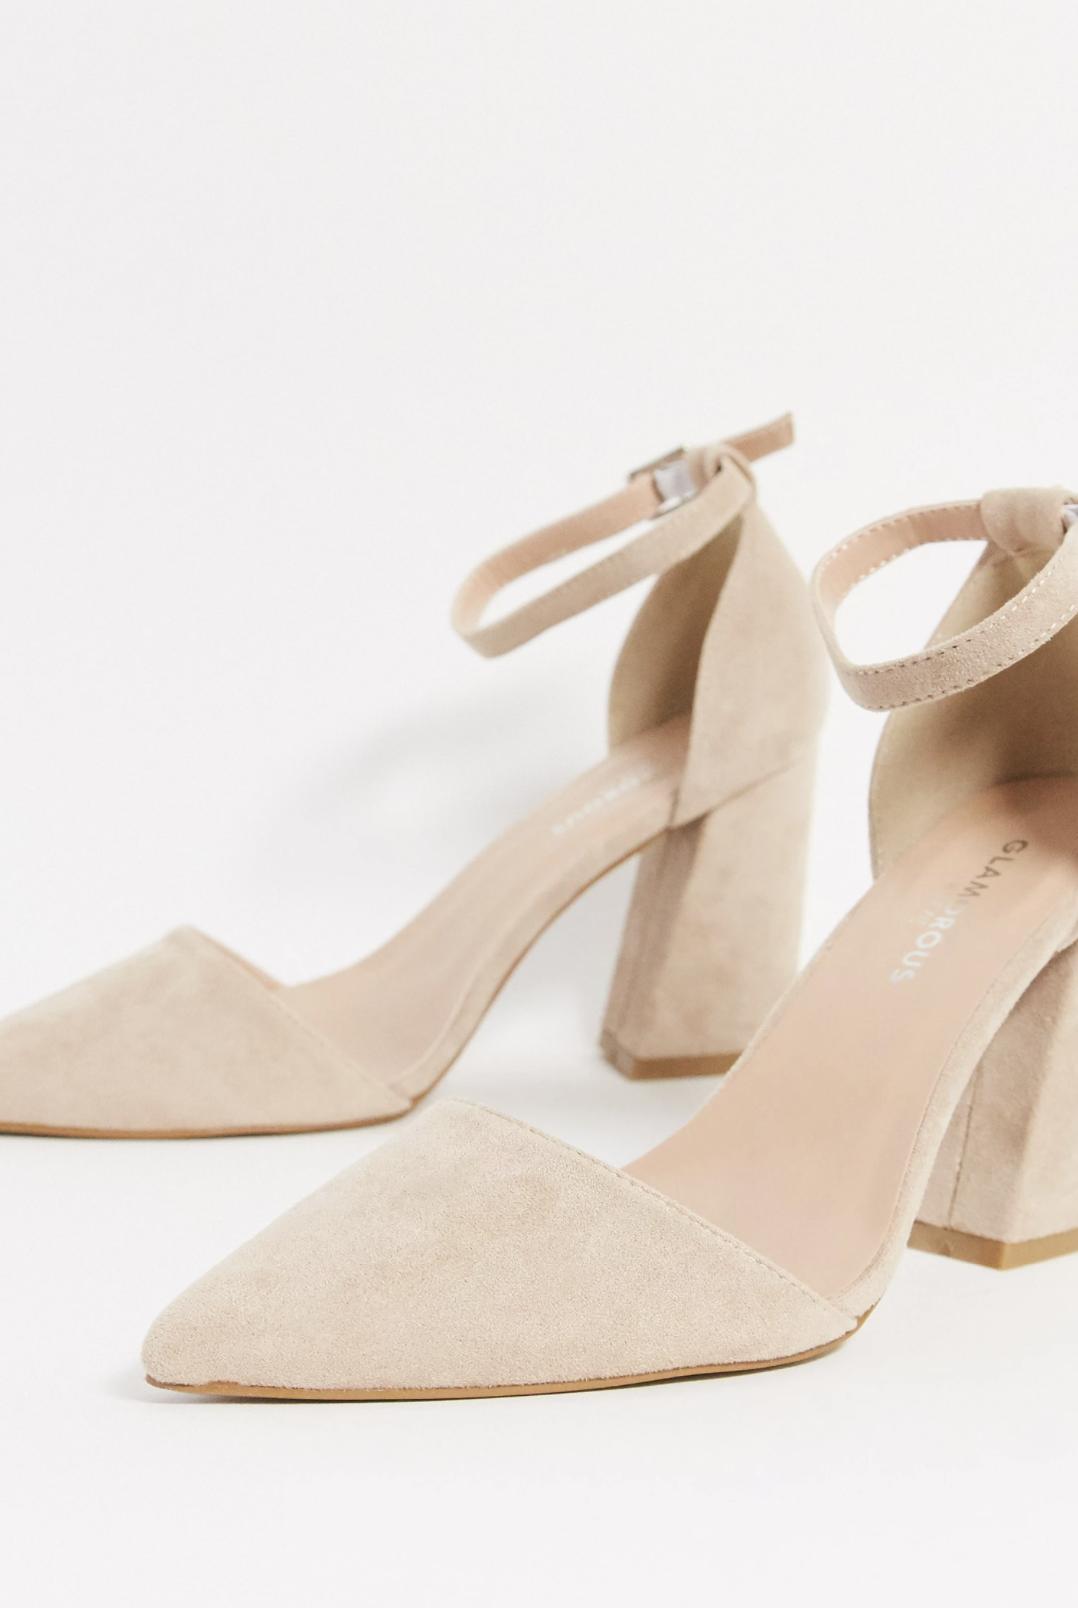 Zapatos de salón con tacón cuadrado en beis de Glamorous Wide Fit